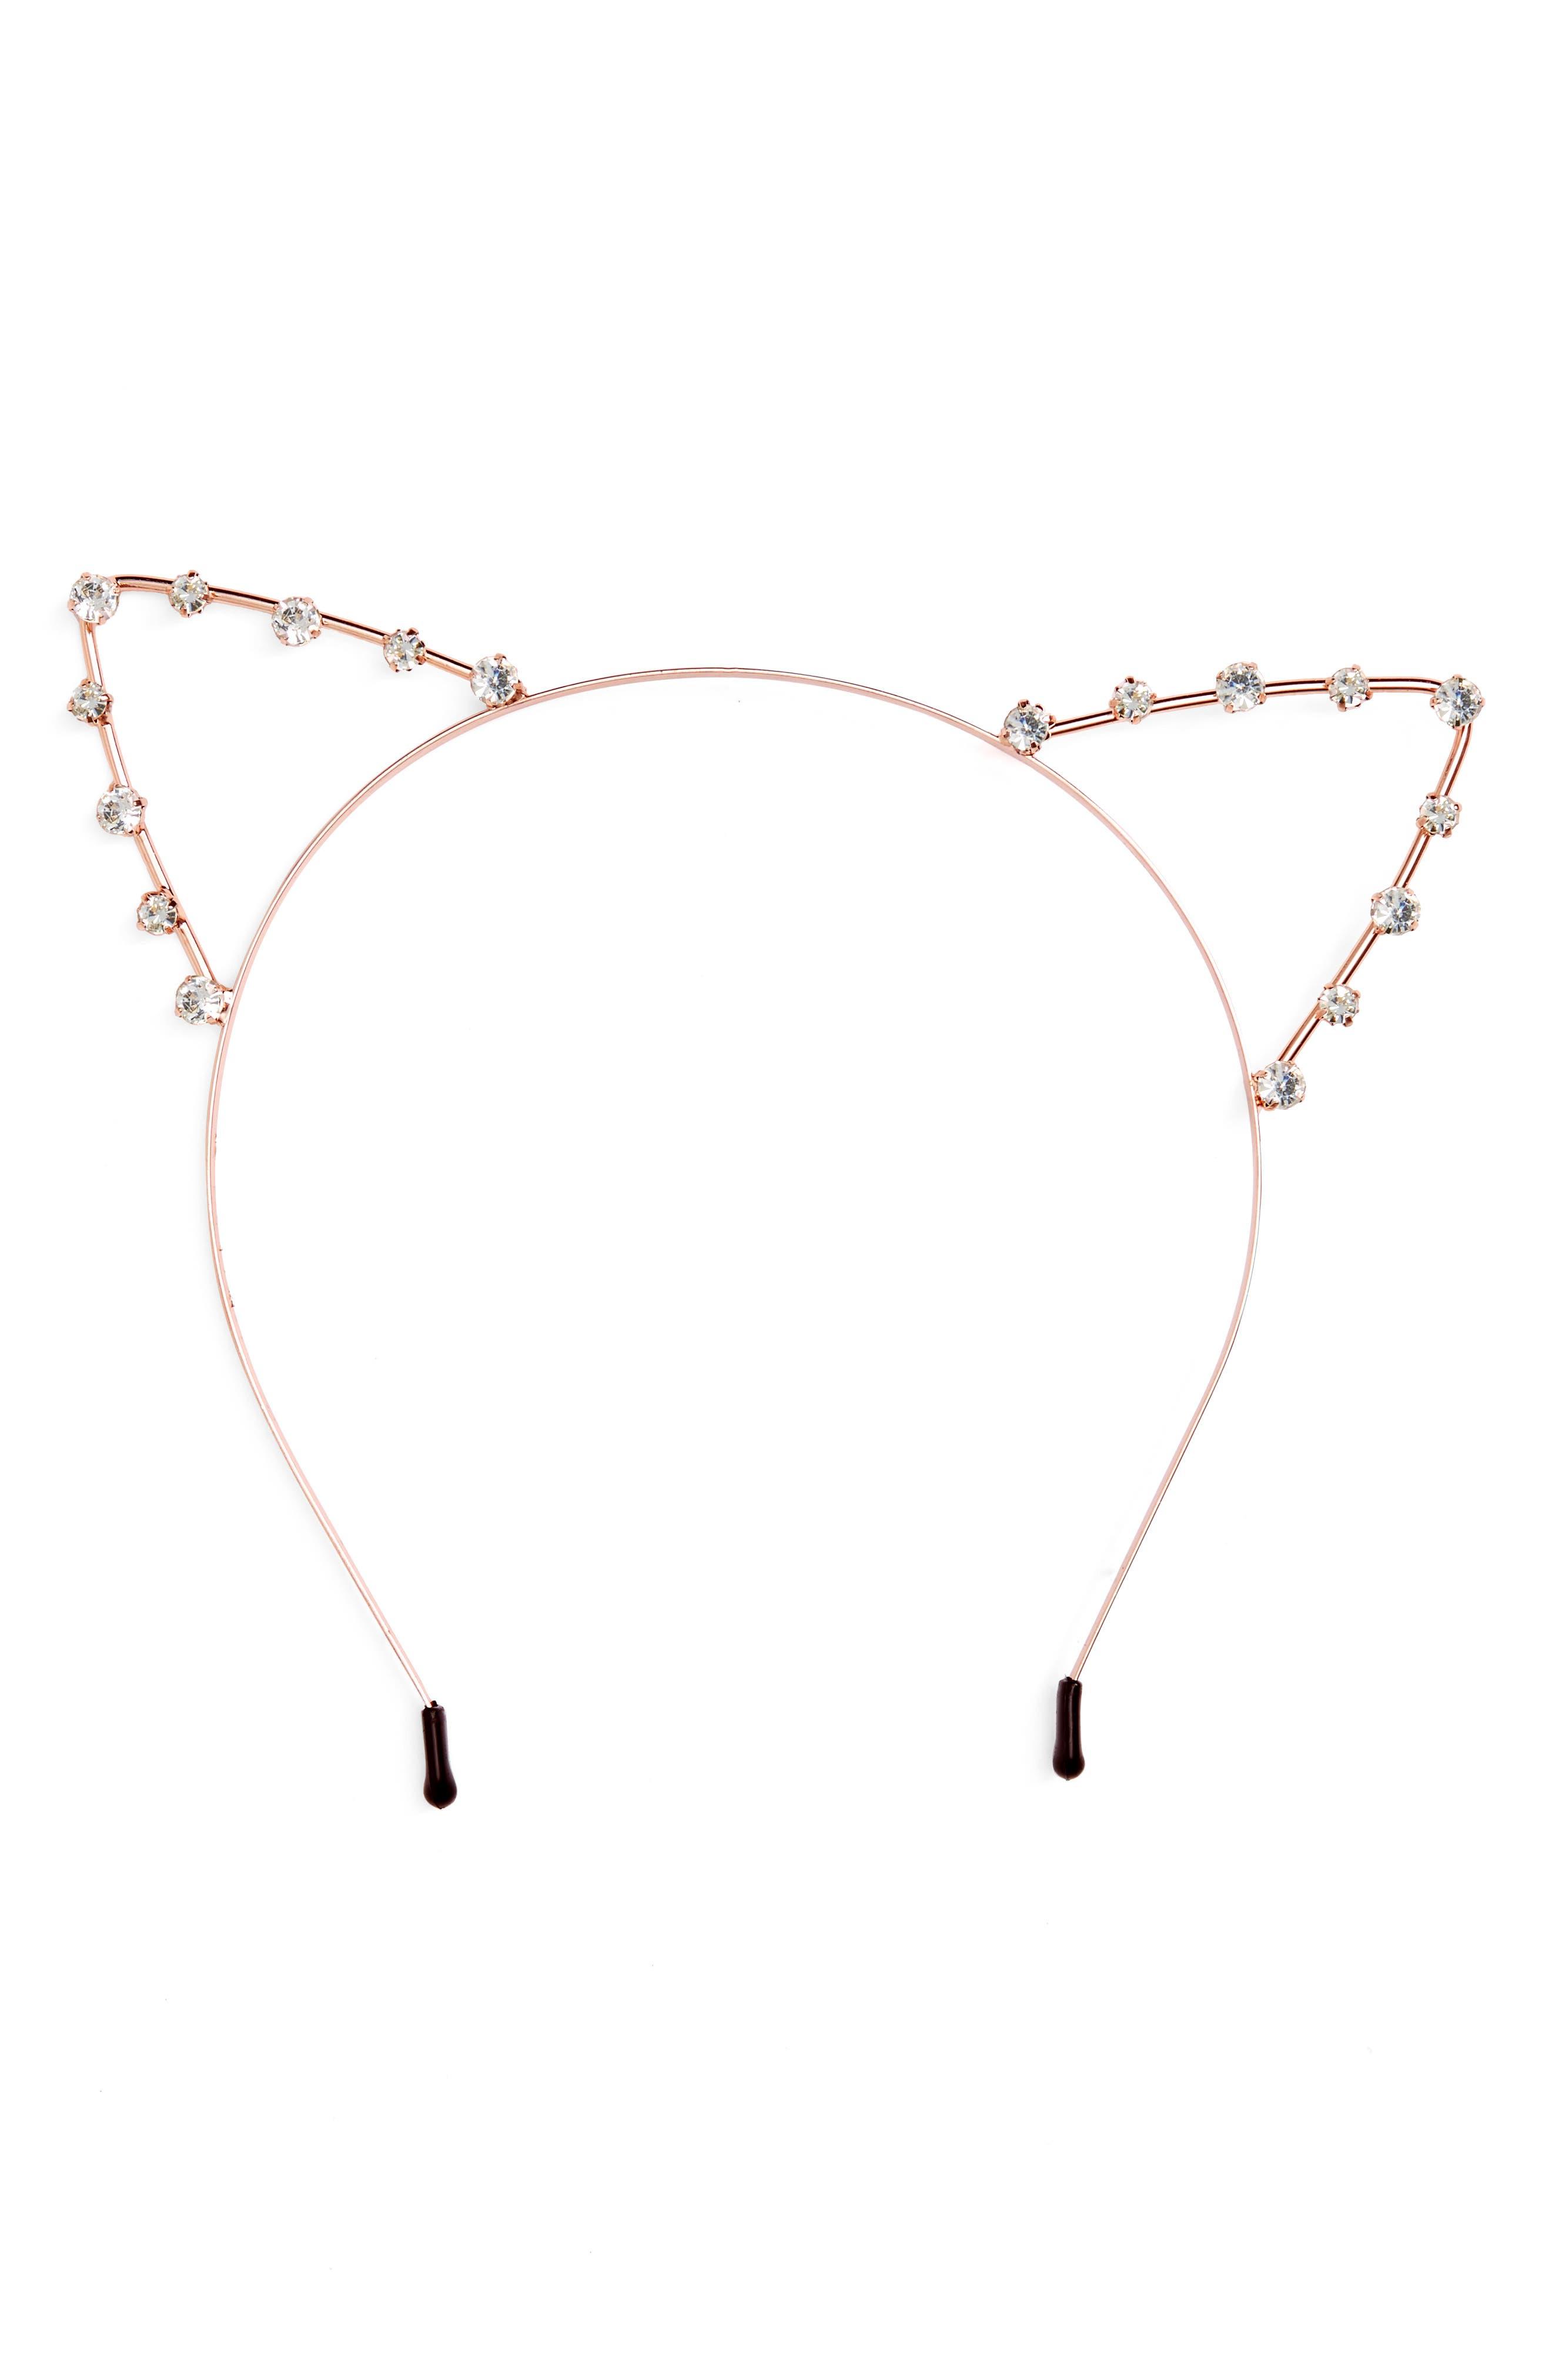 Crystal Cat Ears Headband,                             Main thumbnail 1, color,                             711